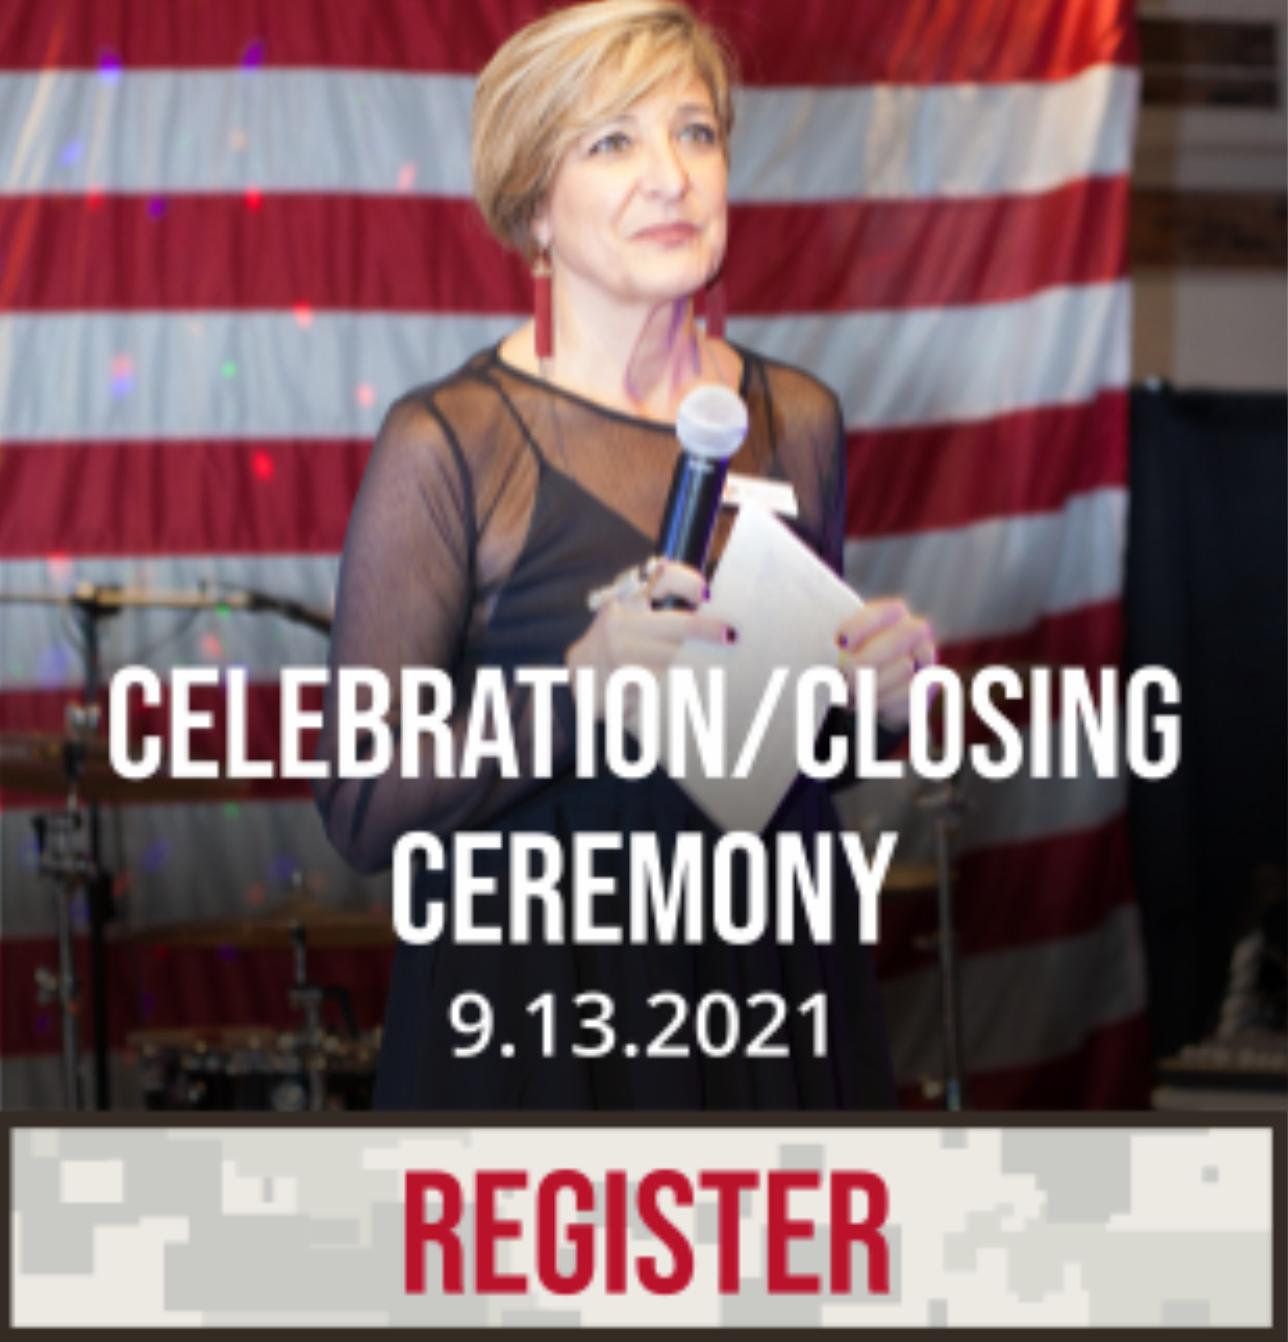 celebration/closing ceremony. 9/13/21. click here to register